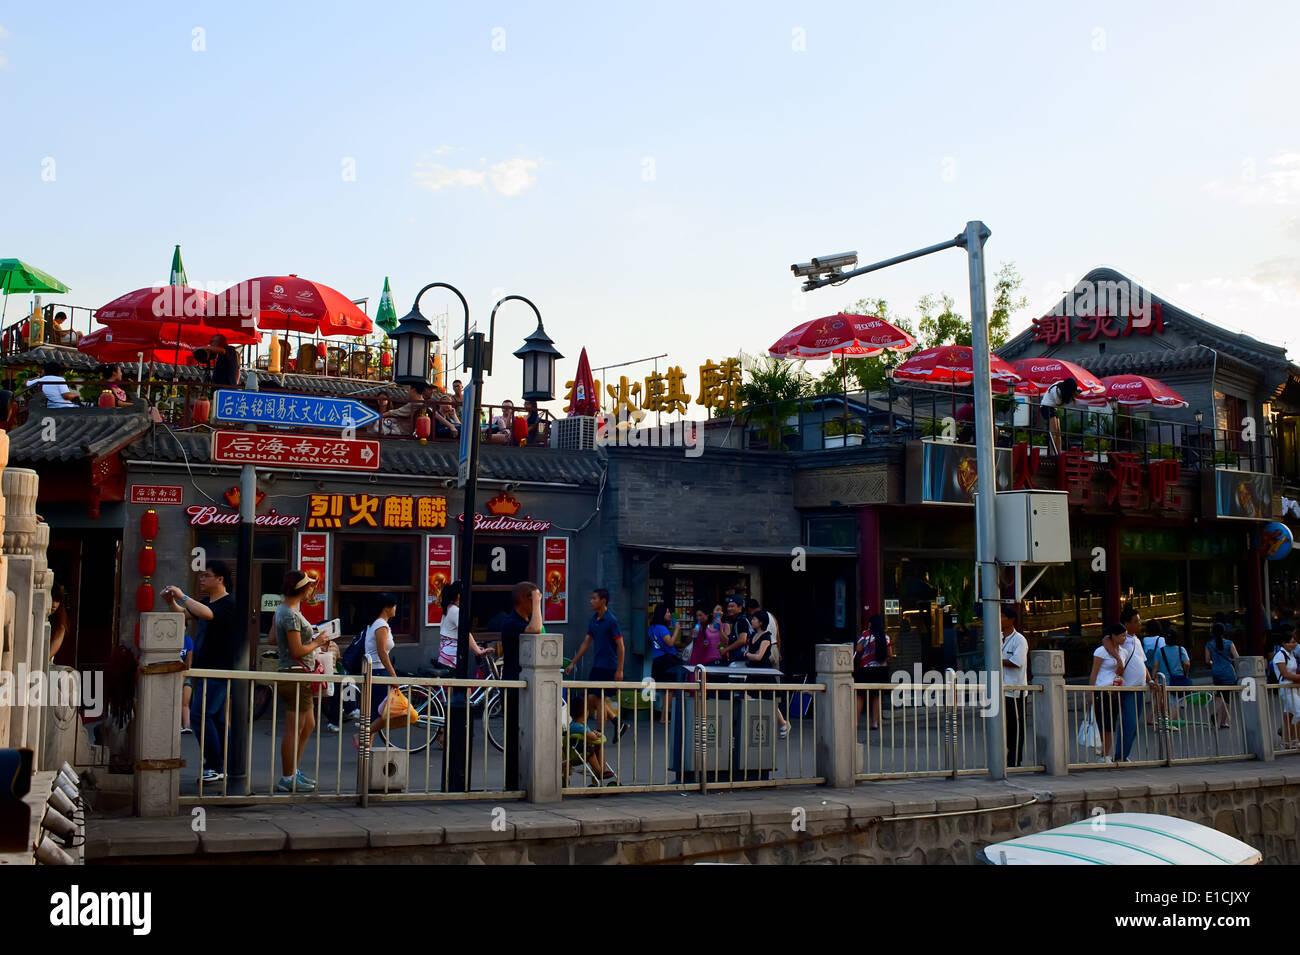 Bar street in Shichahai at dusk, Beijing - Stock Image